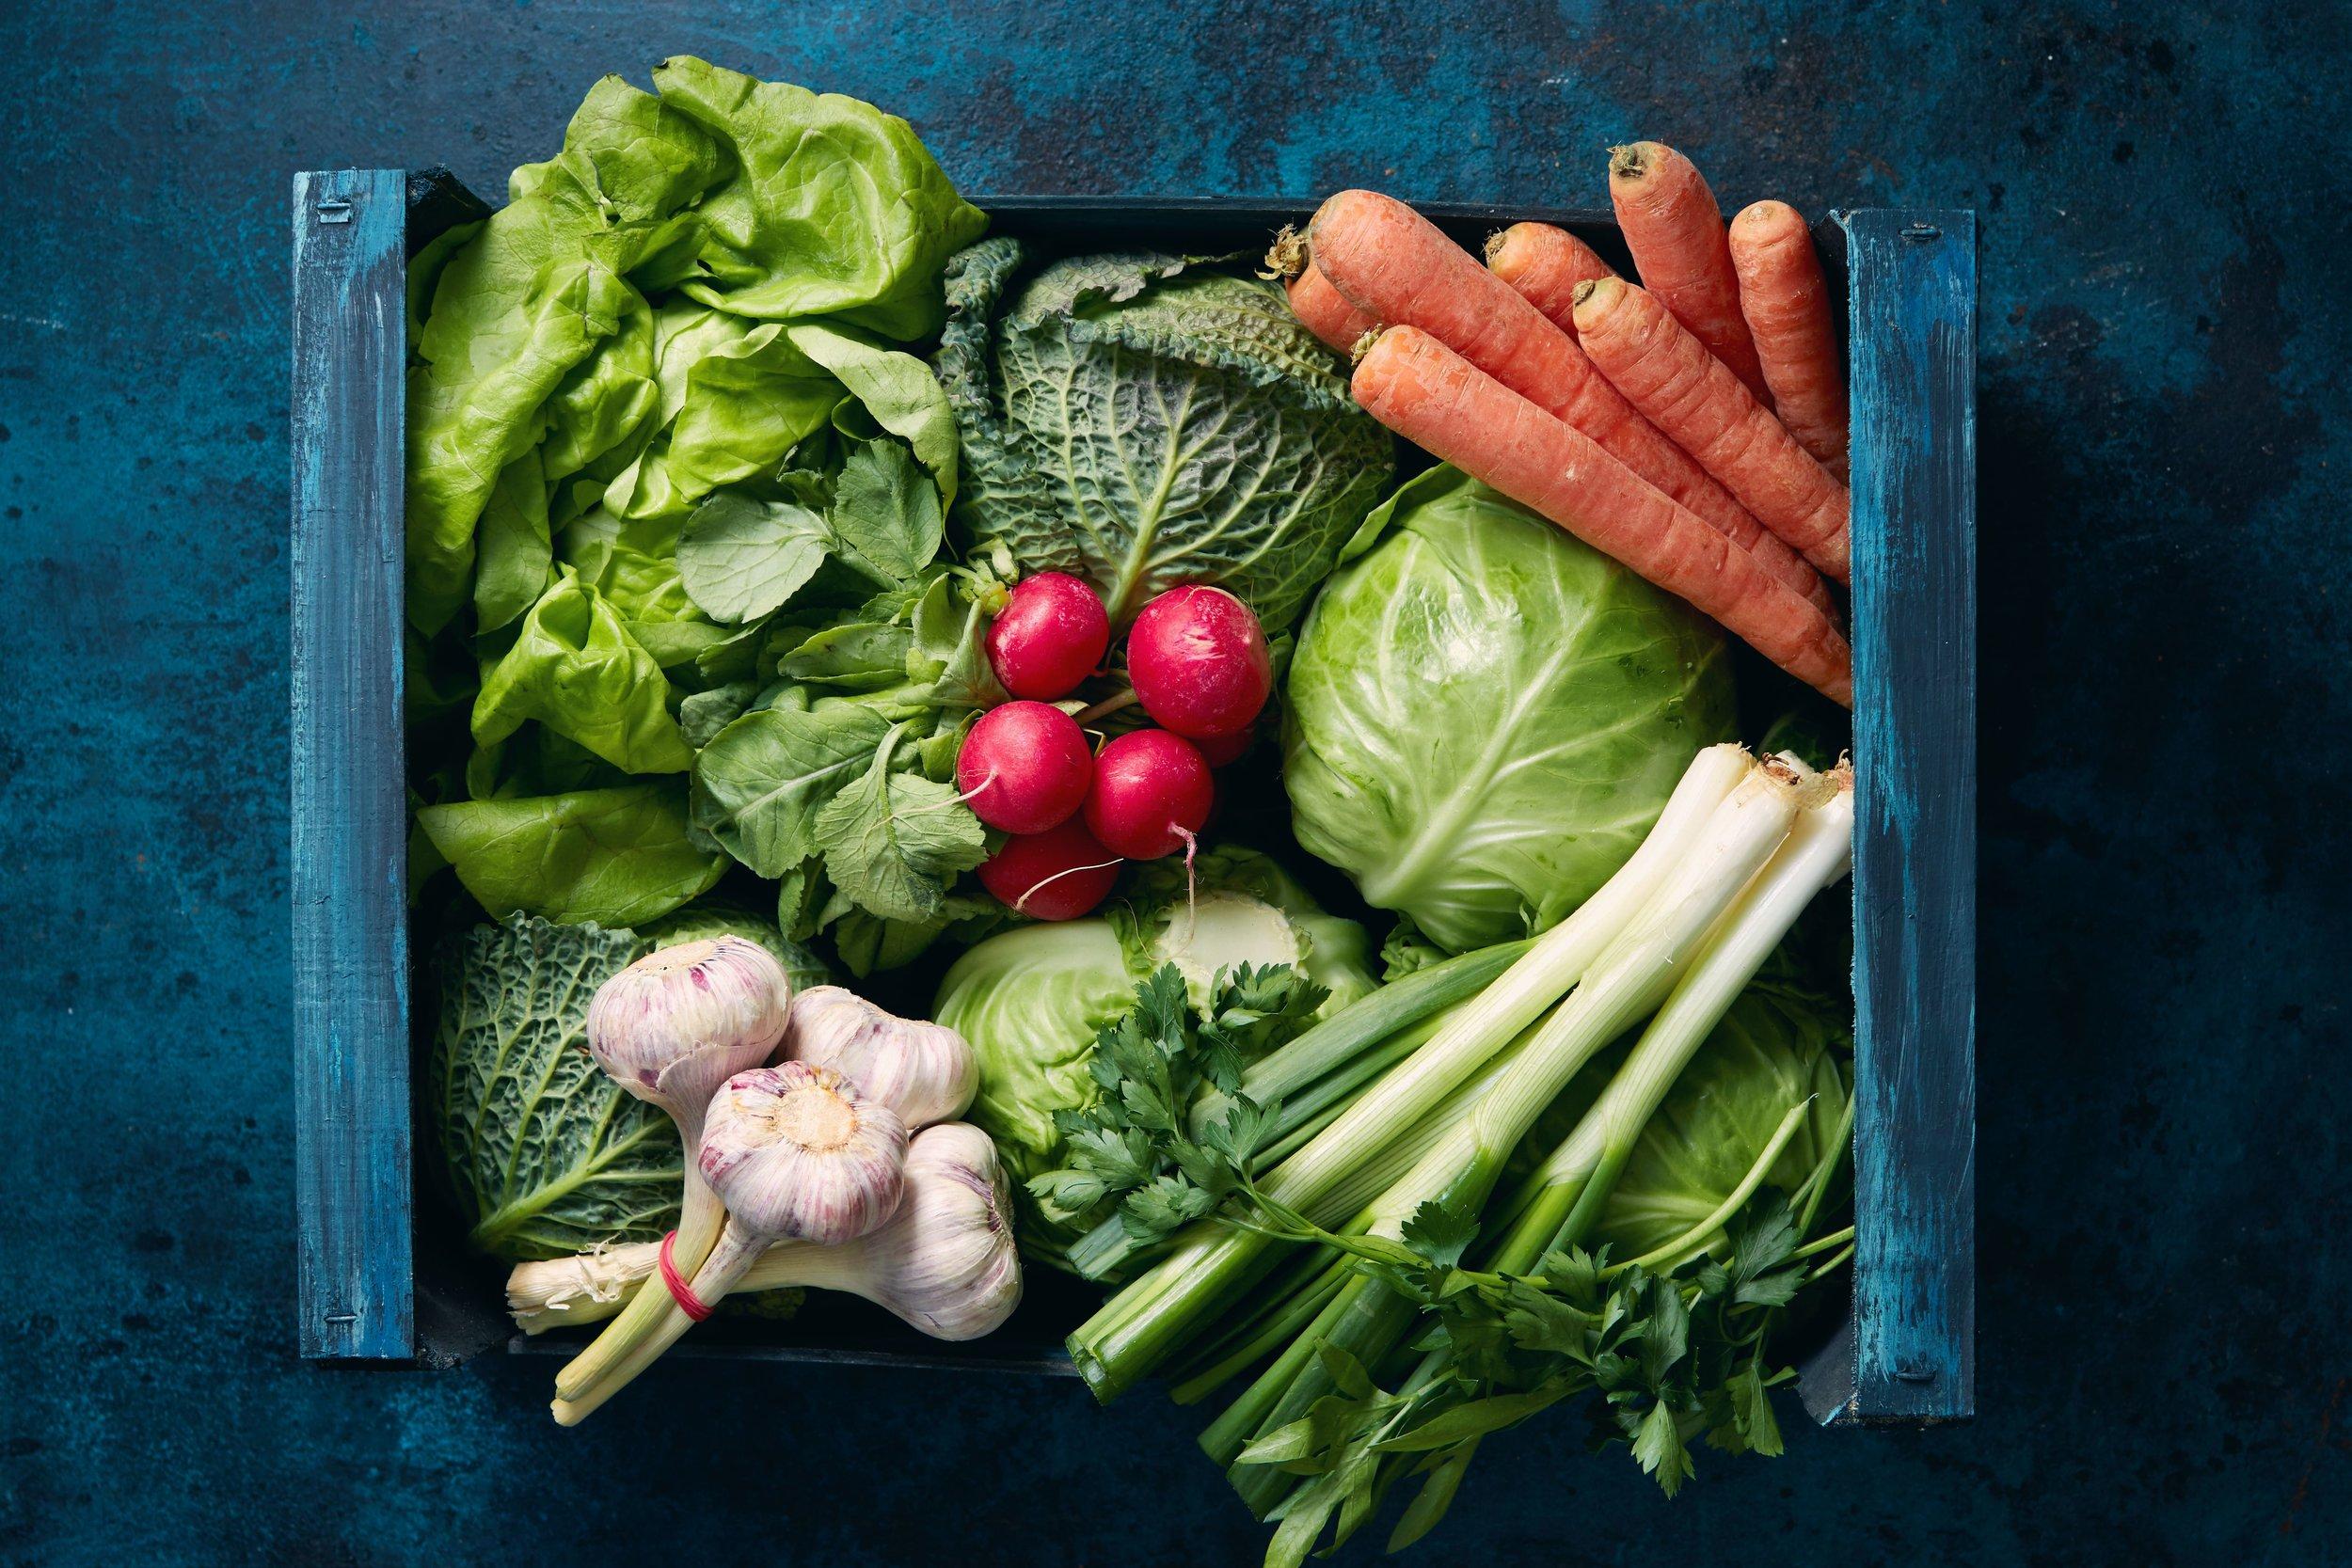 food background - produce.jpg